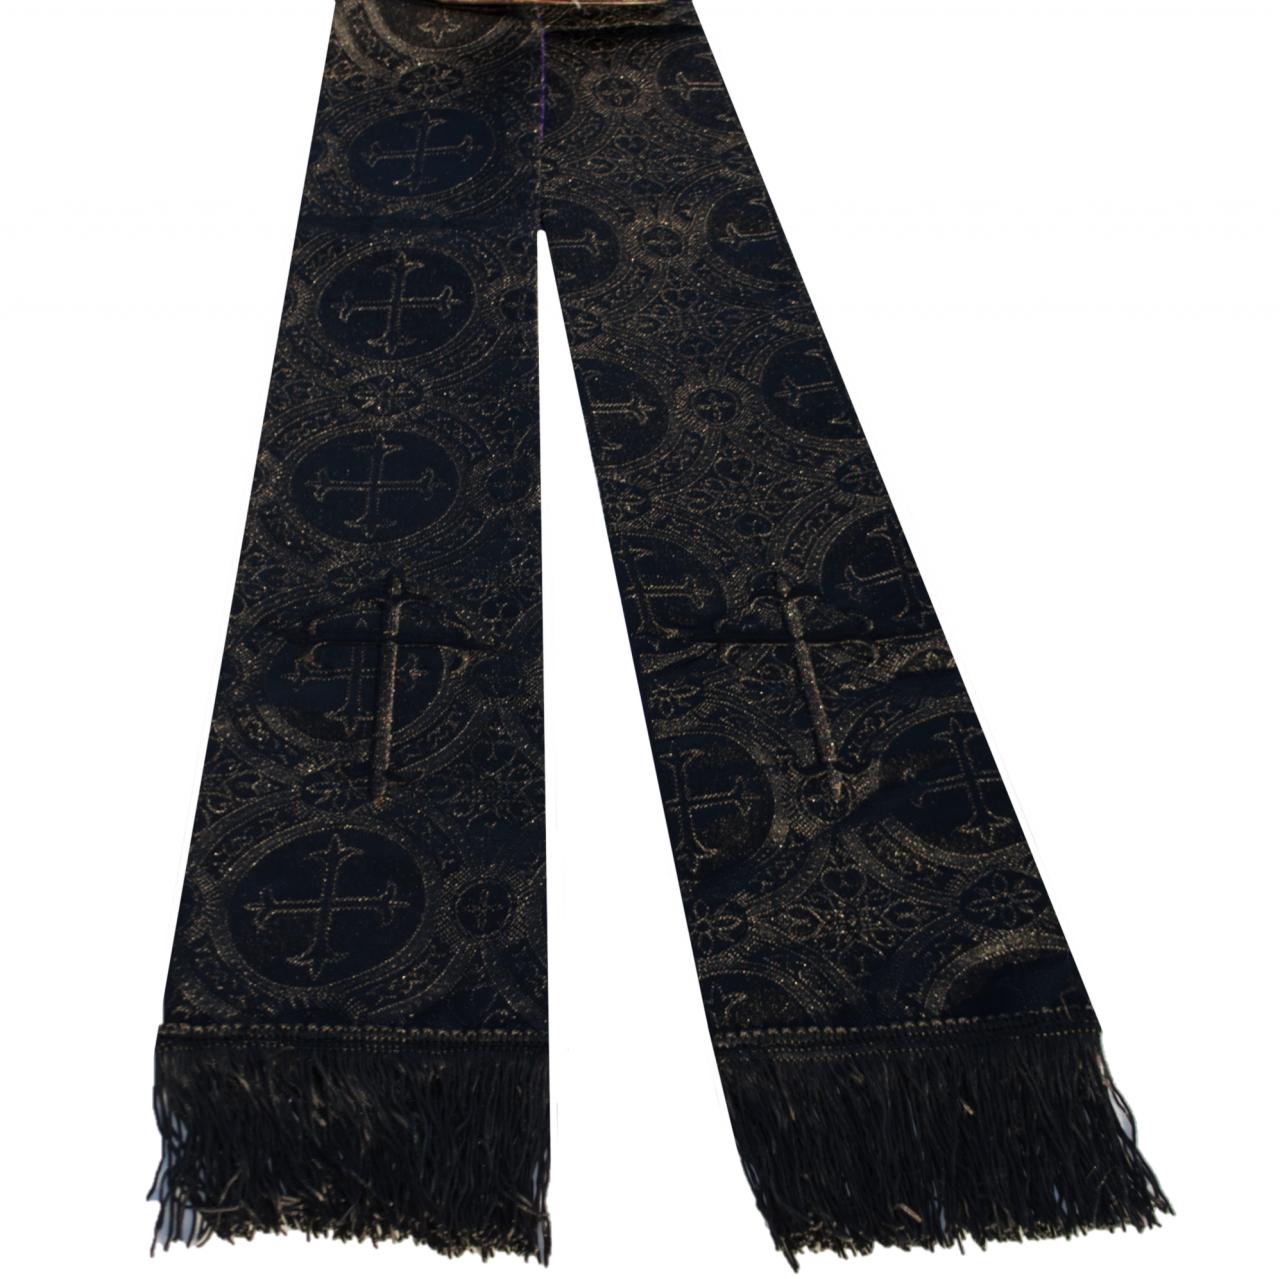 Premium Brocade Clergy Stole - Solid Black